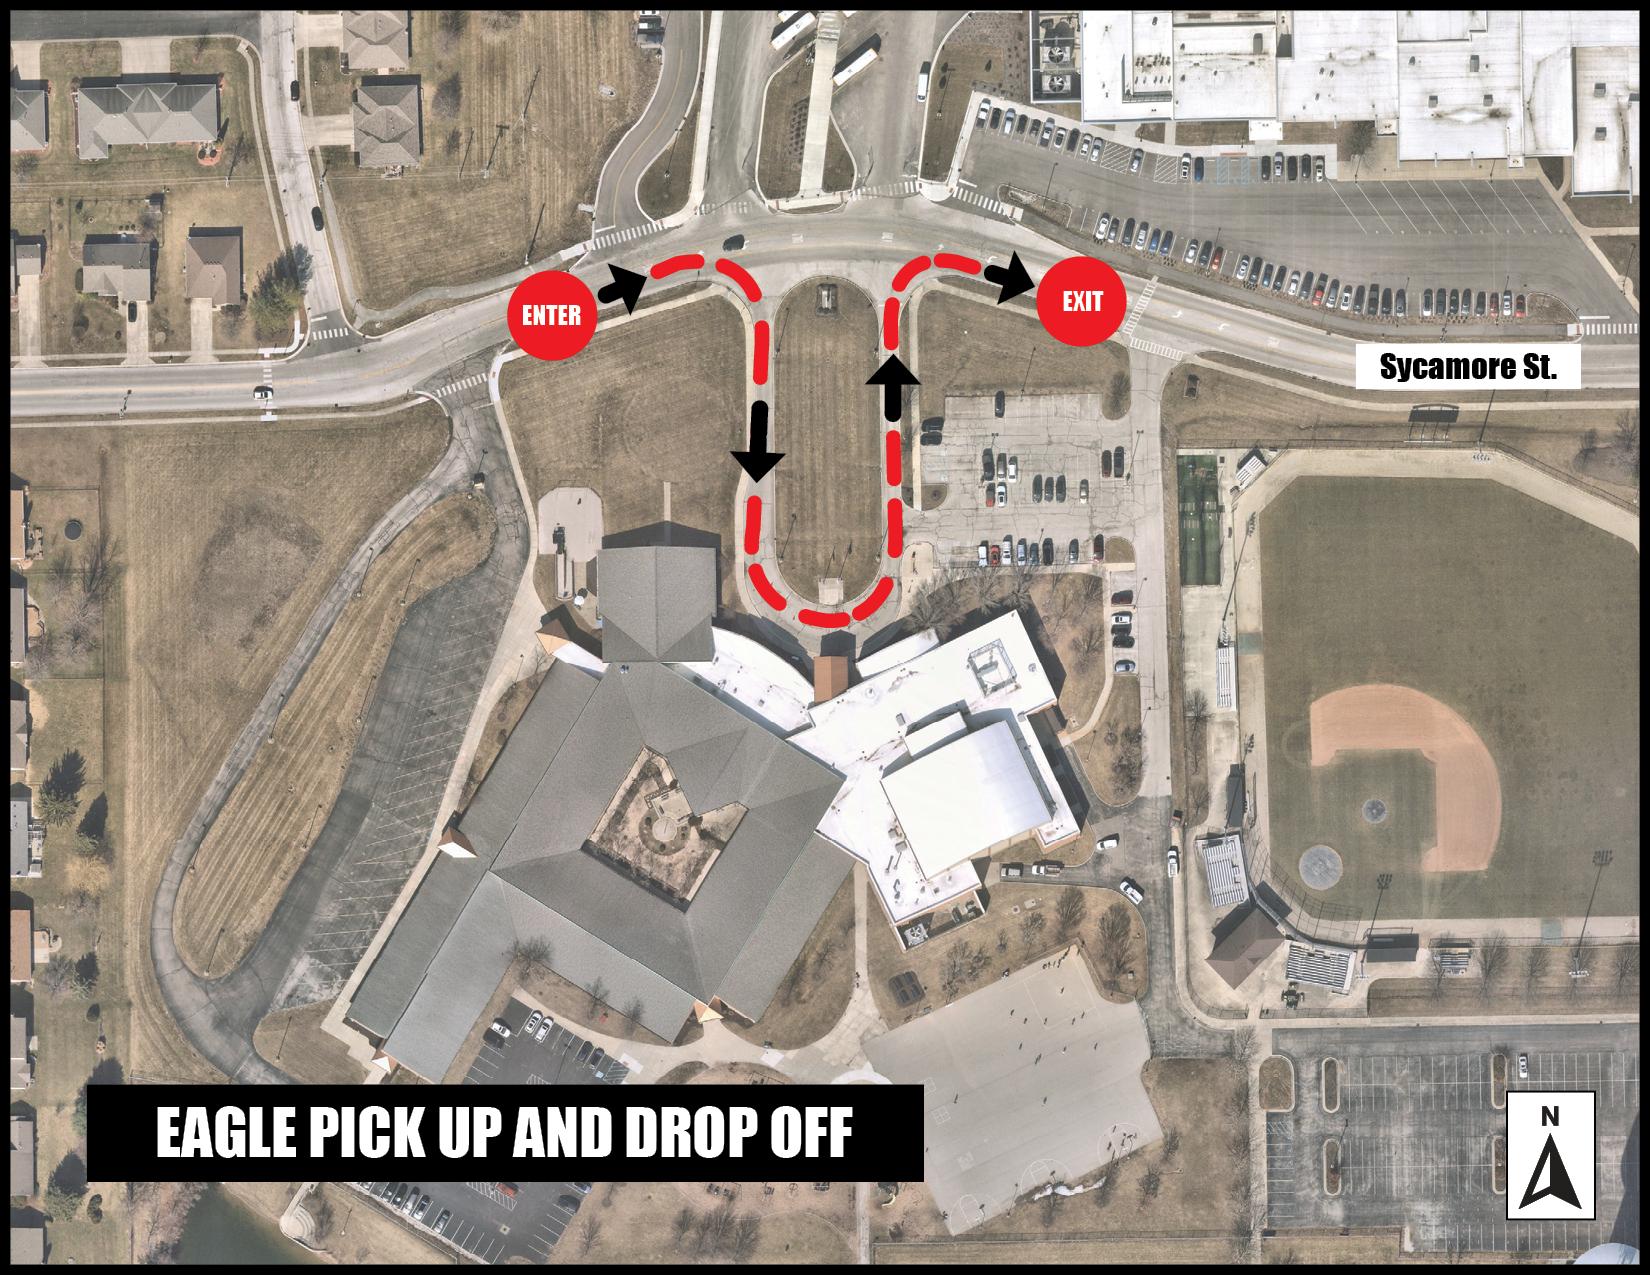 Eagle Pickup Drop off map